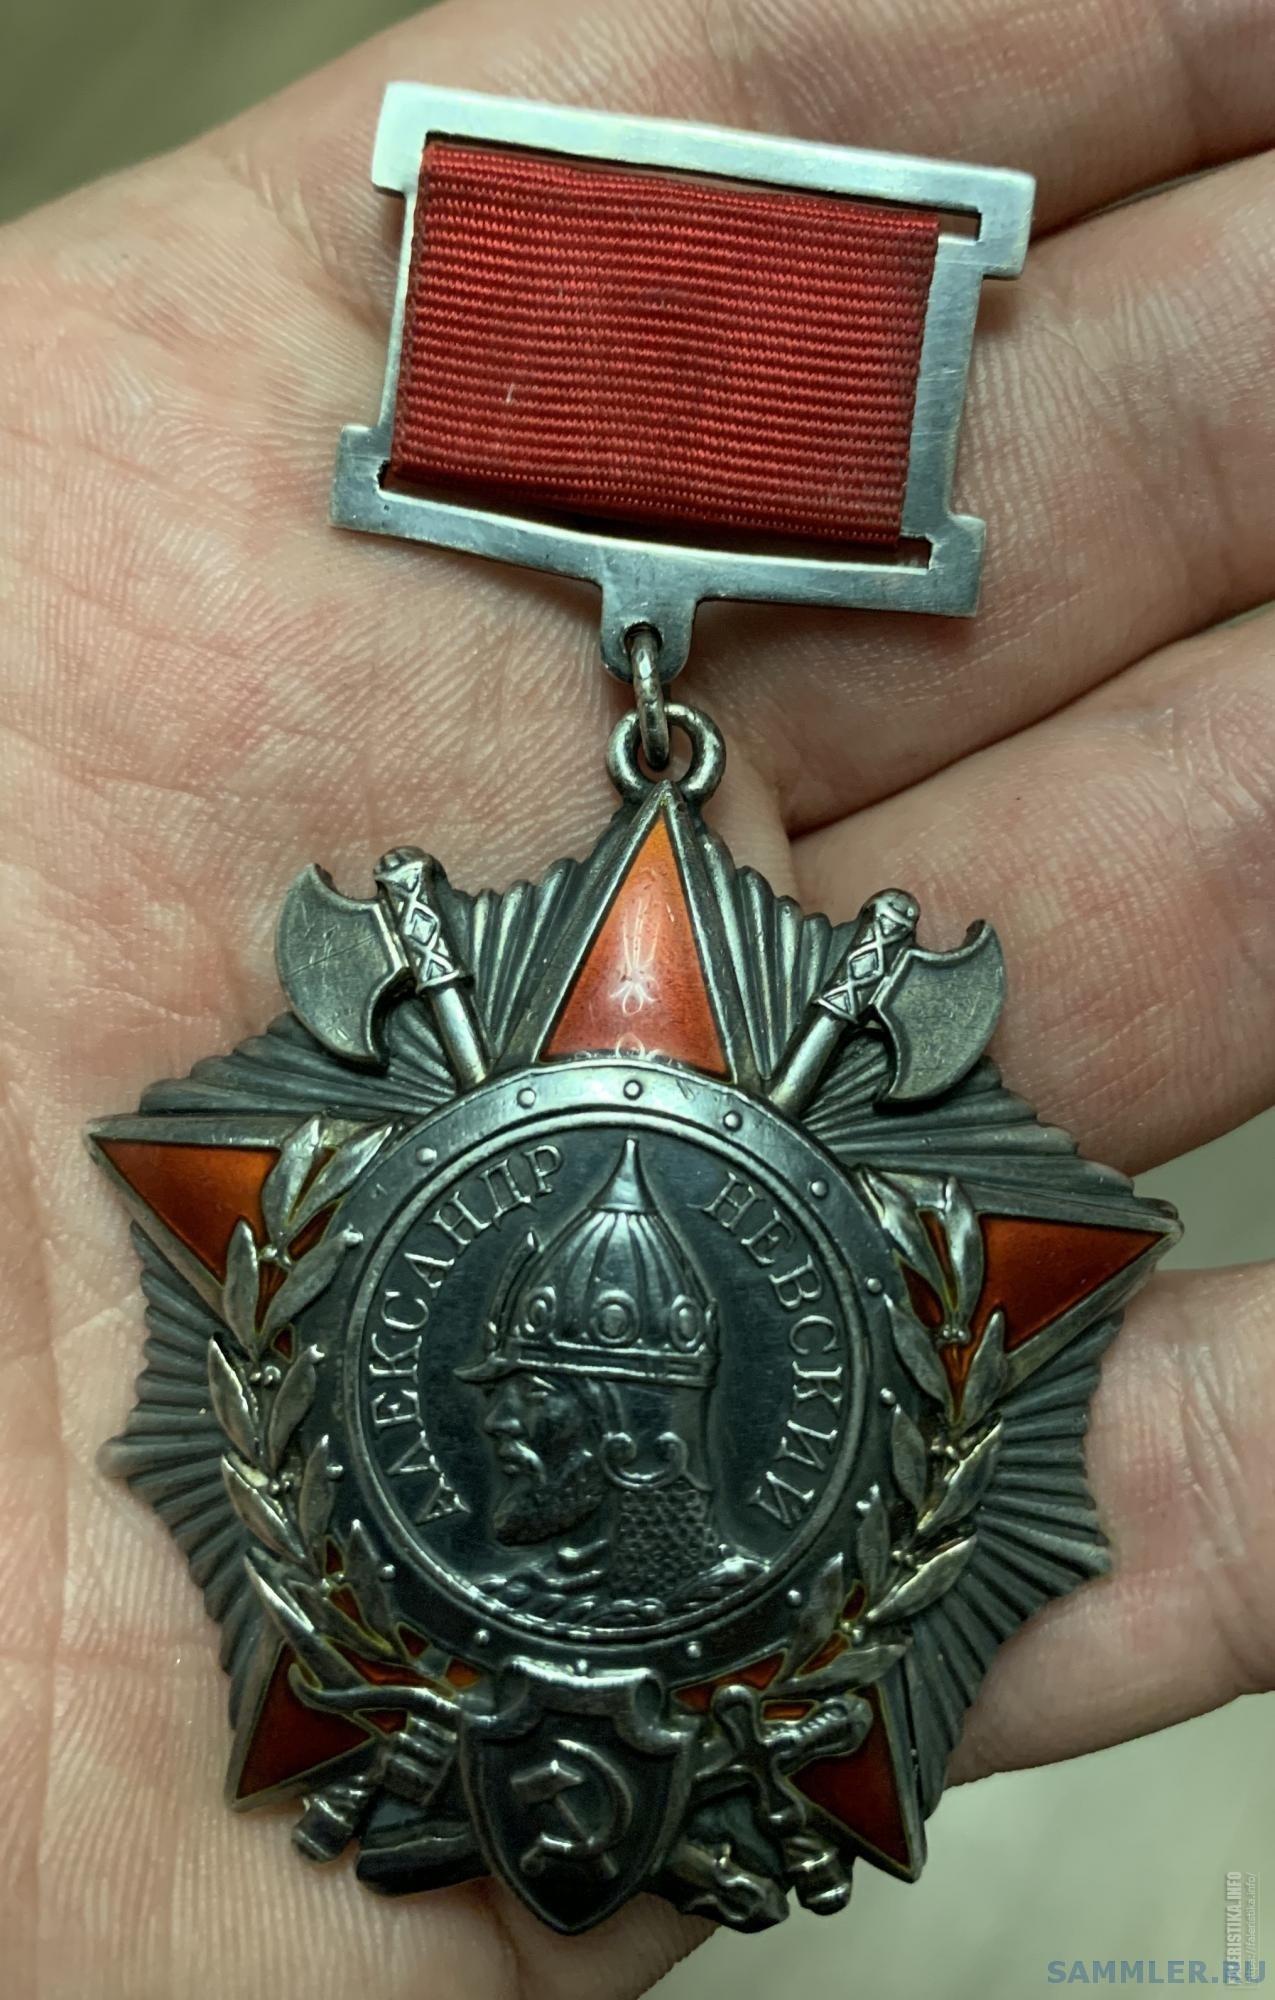 Орден Невского, №913, подвес_1.jpg